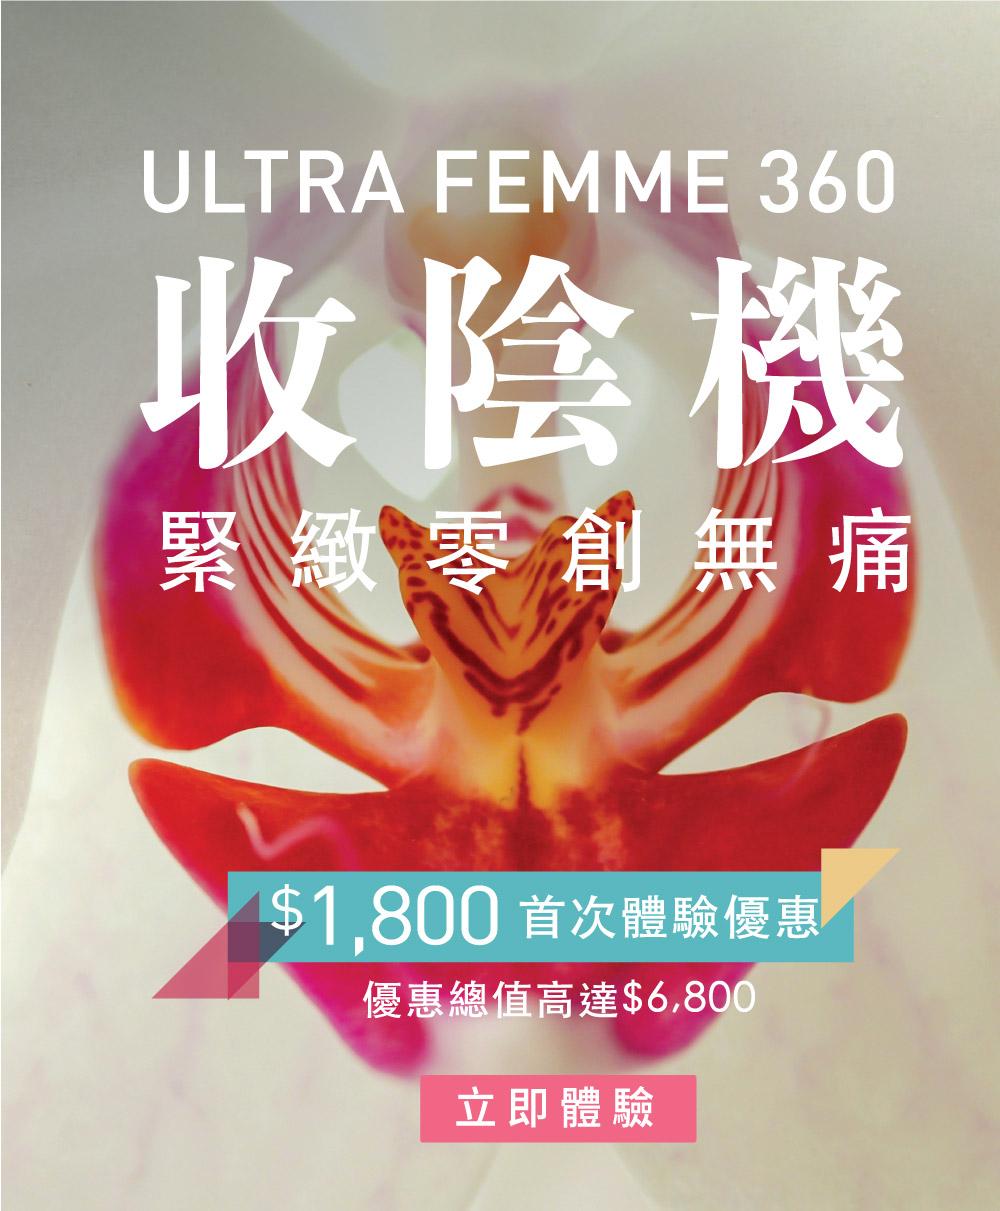 ULTRA FEMME 360收陰機緊緻零創無痛